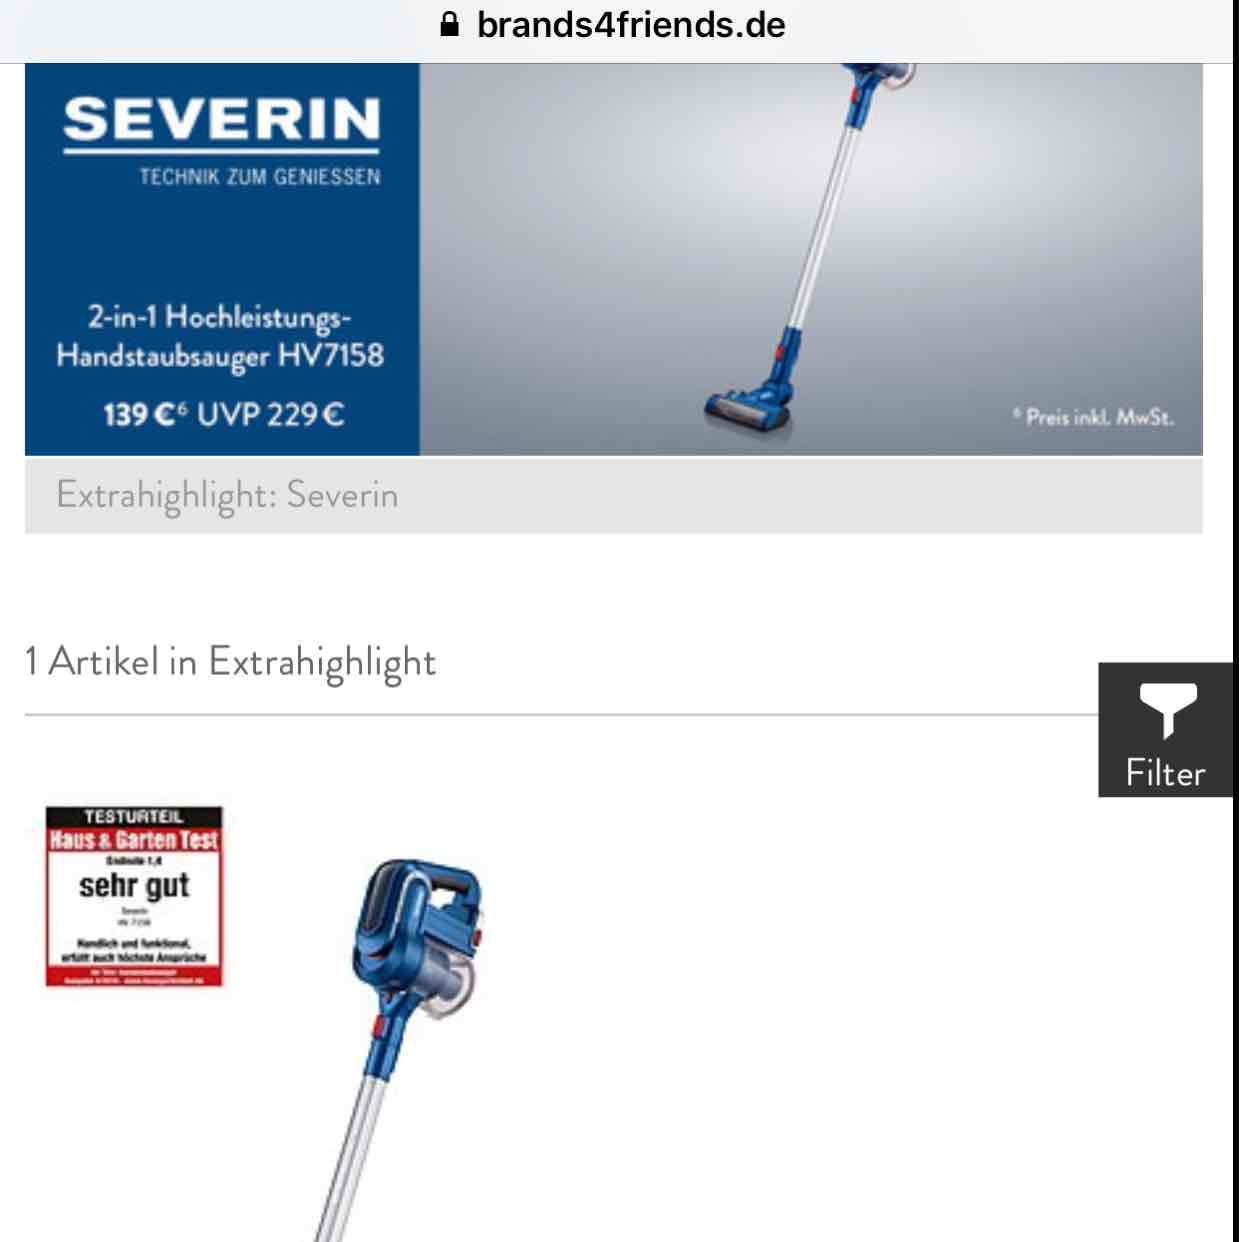 Dyson V6 Alternative Severin HV7158 bei b4f für 139€ (124€ möglich)